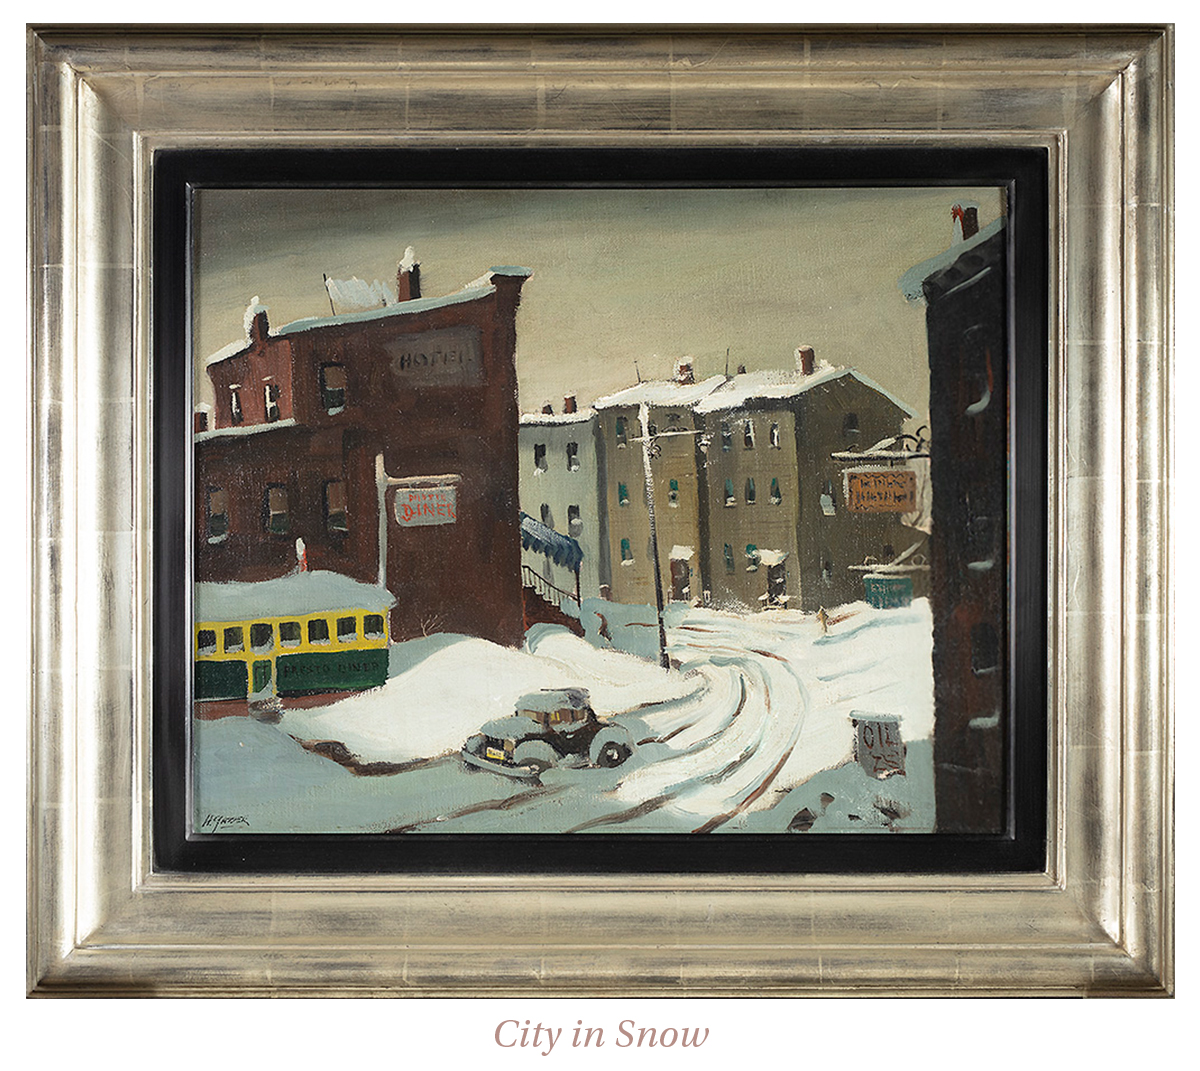 Henry Martin Gasser, City in Snow